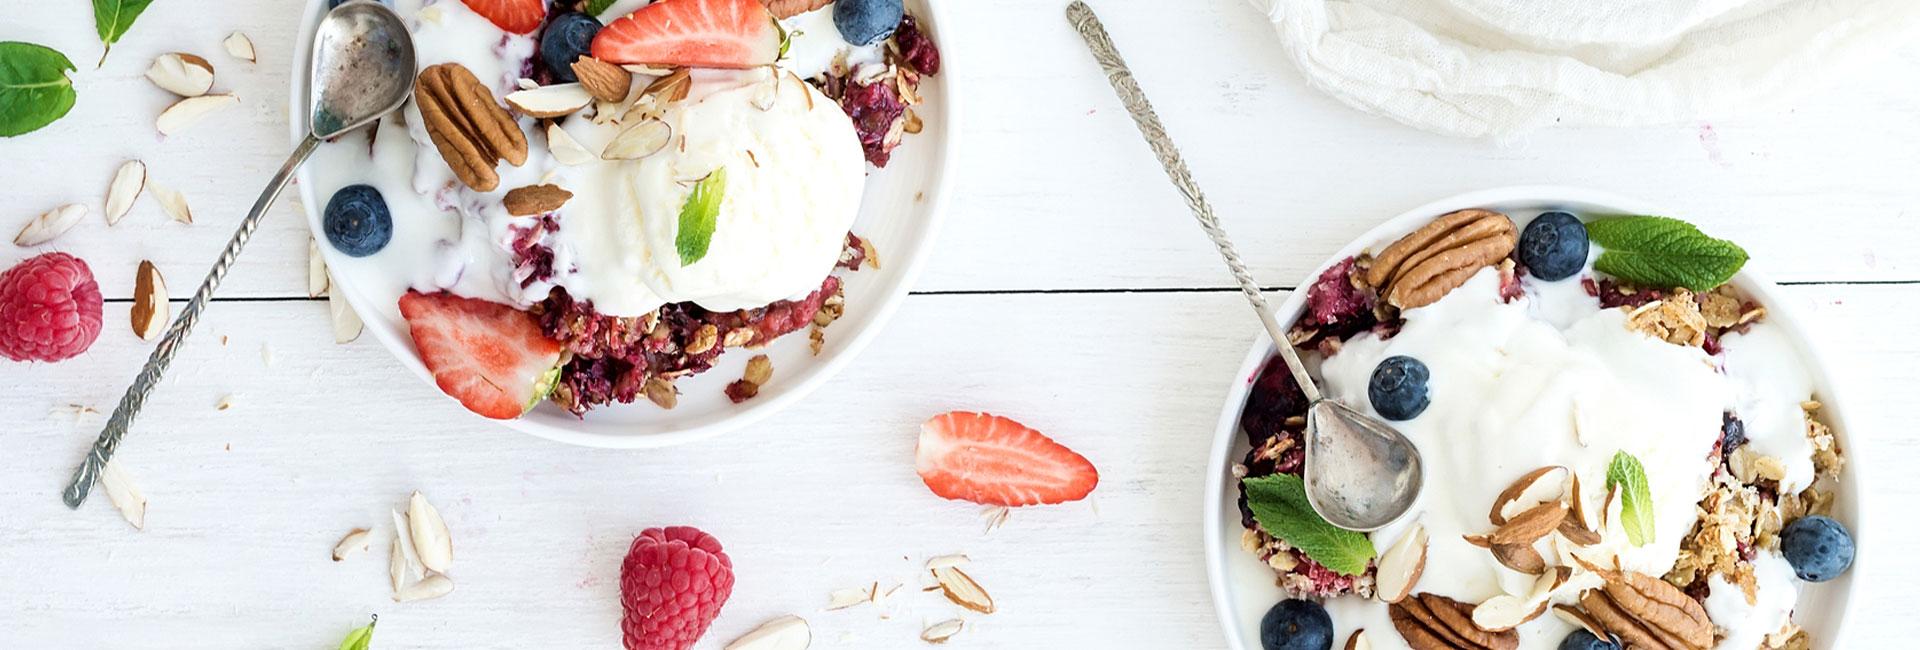 Incluye-yogurt-griego-a-tu-dieta_principal